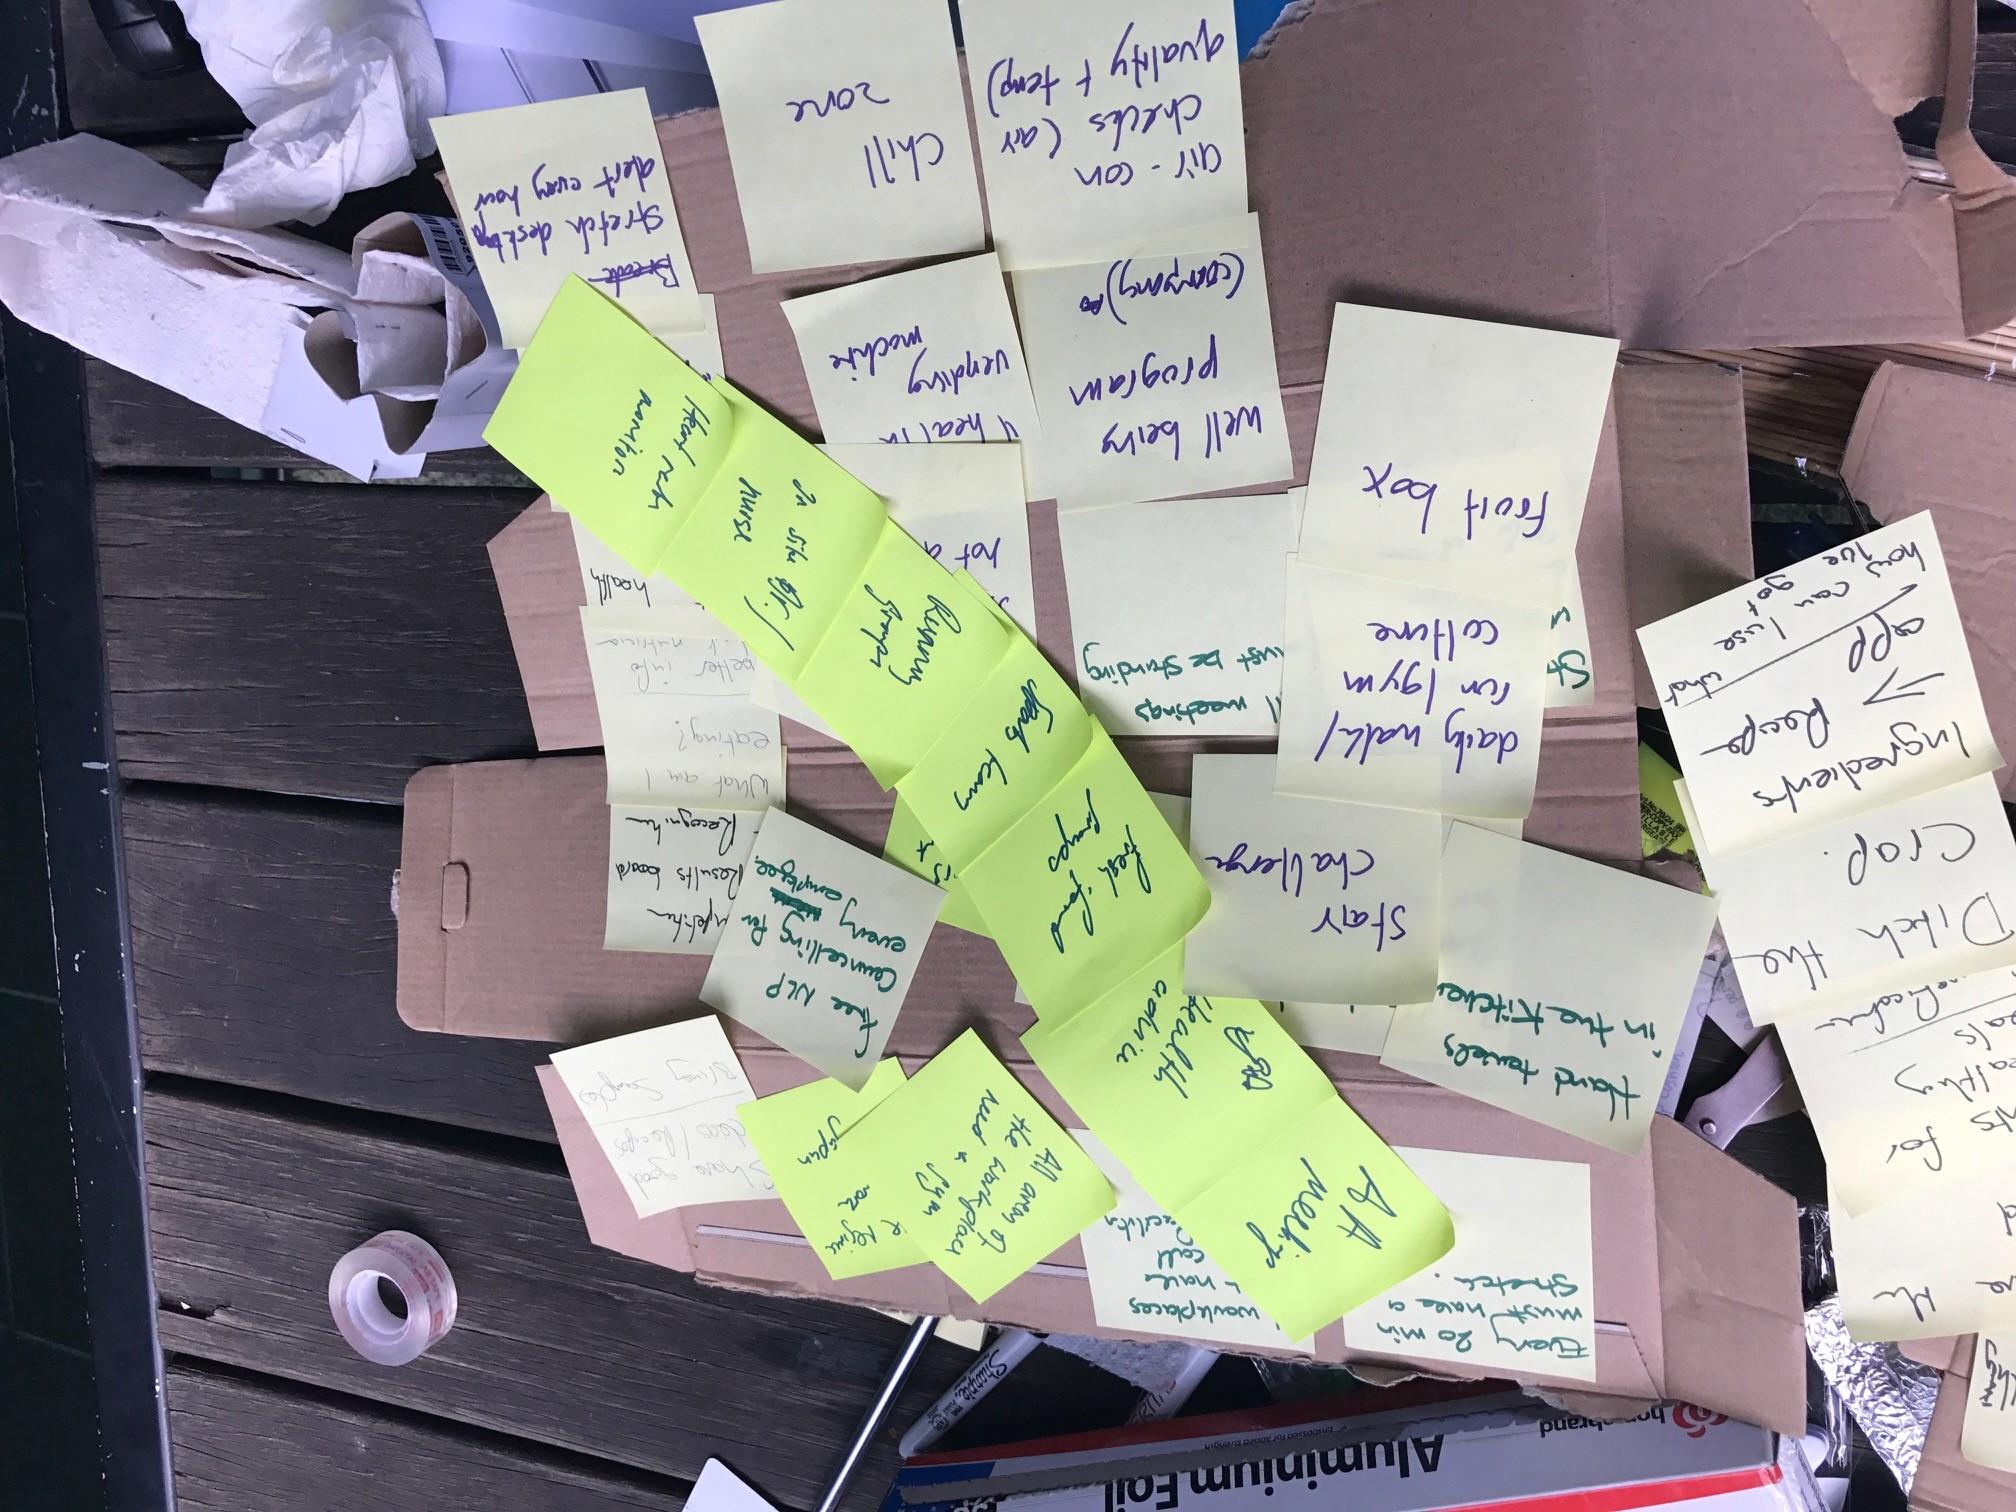 Brainstorming Wikipedia